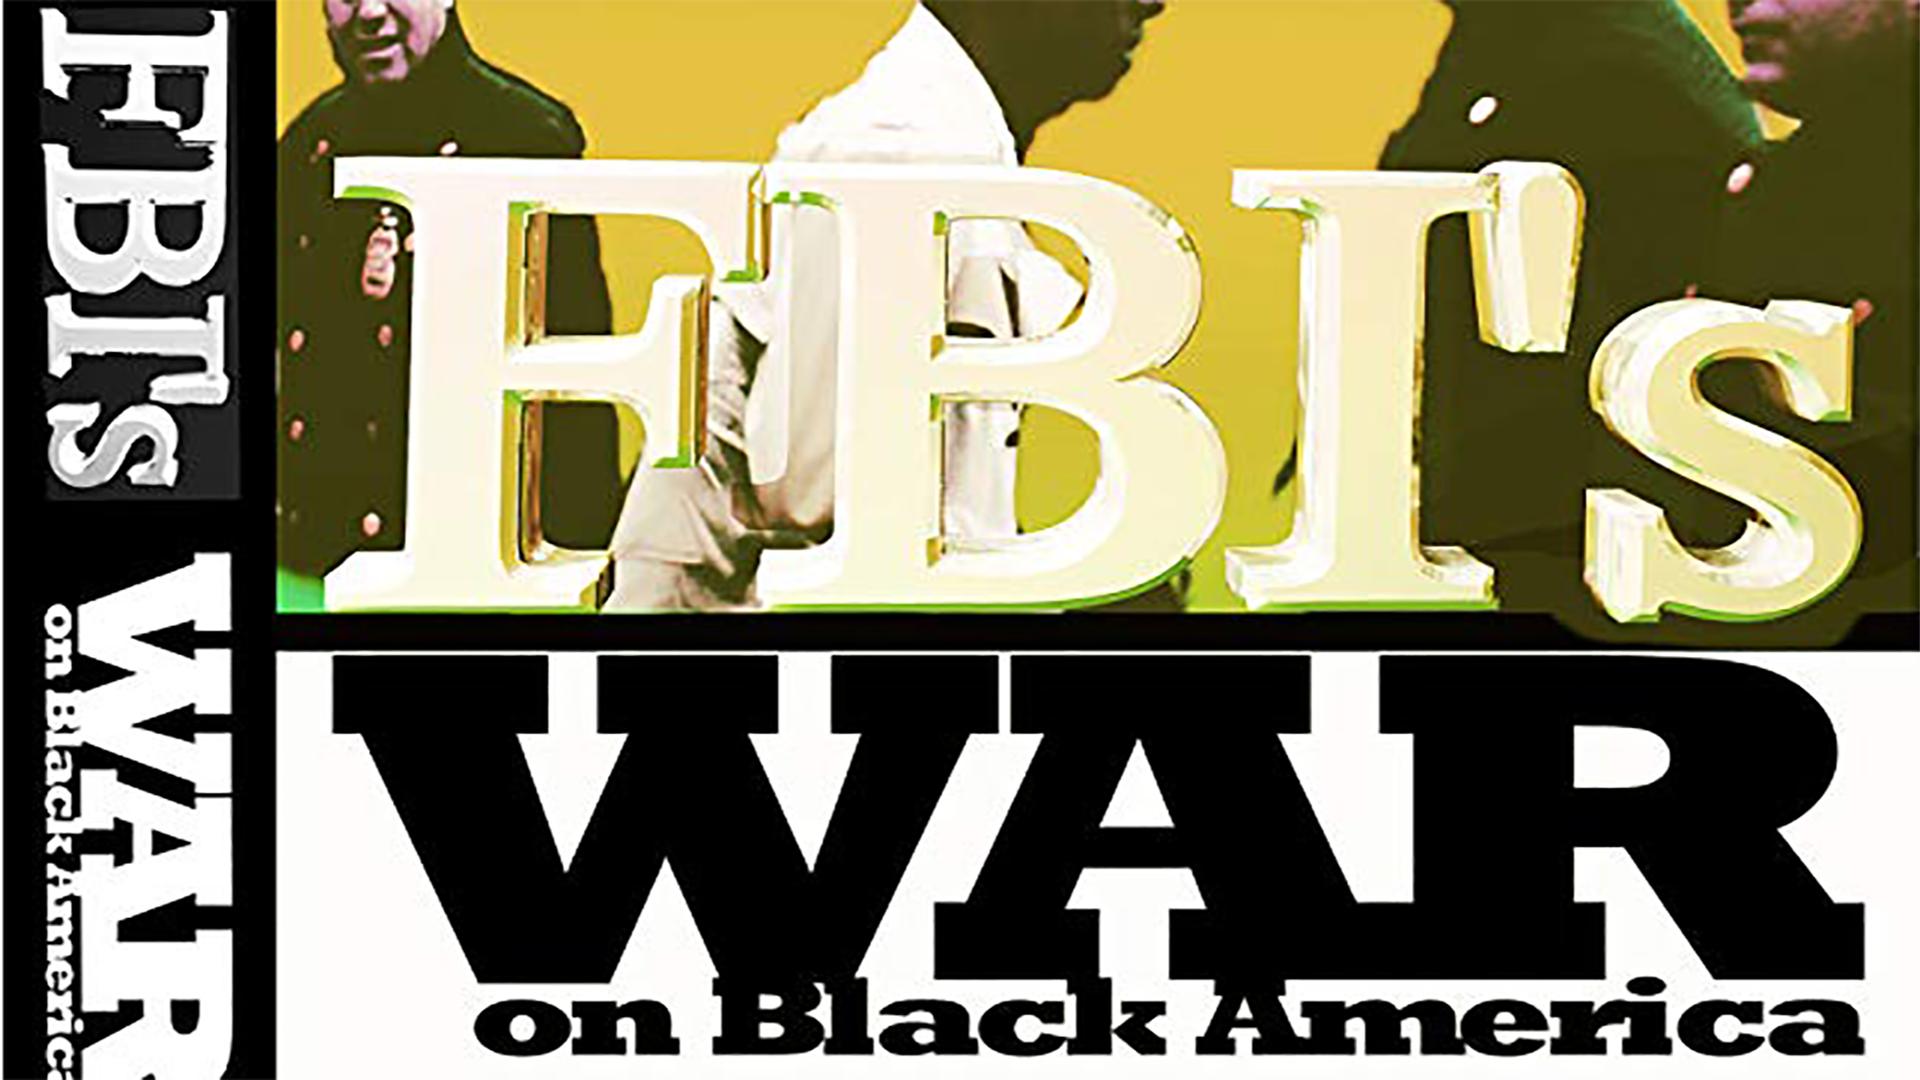 FBI's War on Black America